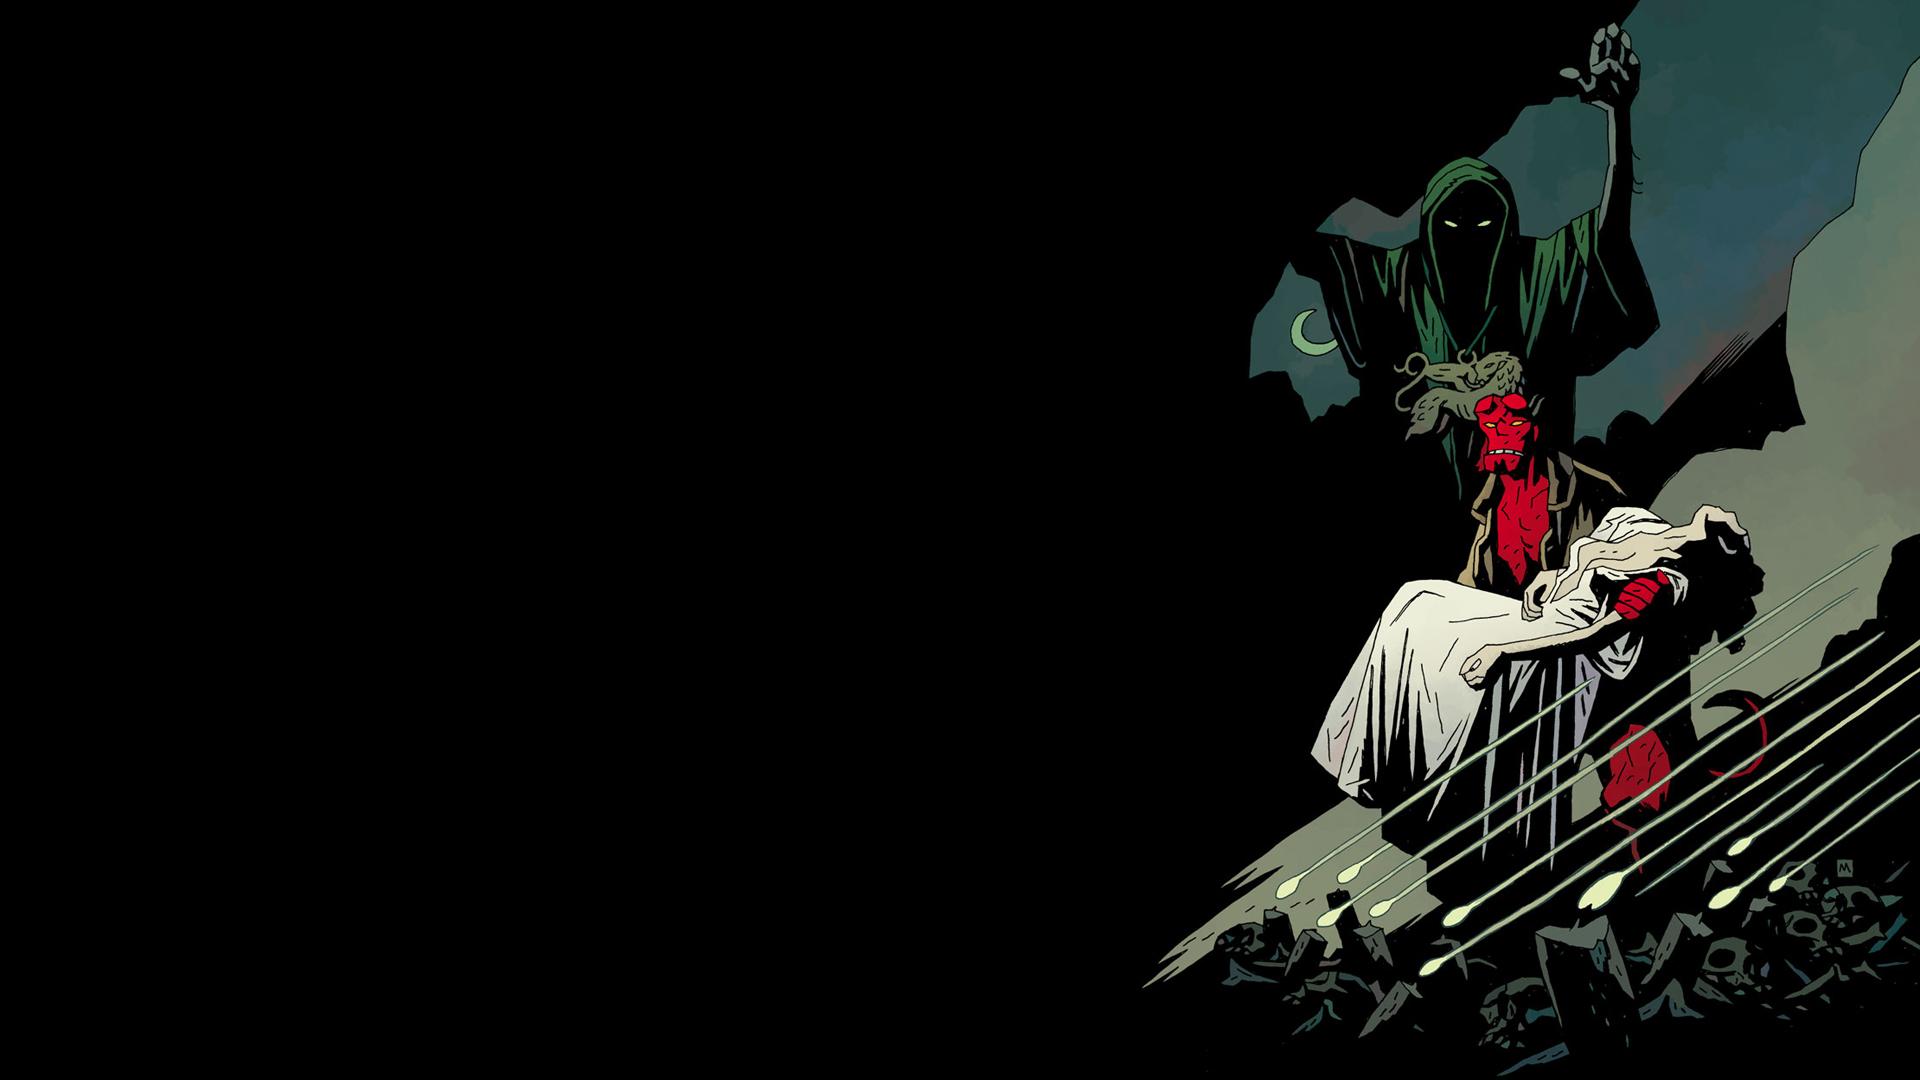 comics hellboy the bride of hell wallpaper